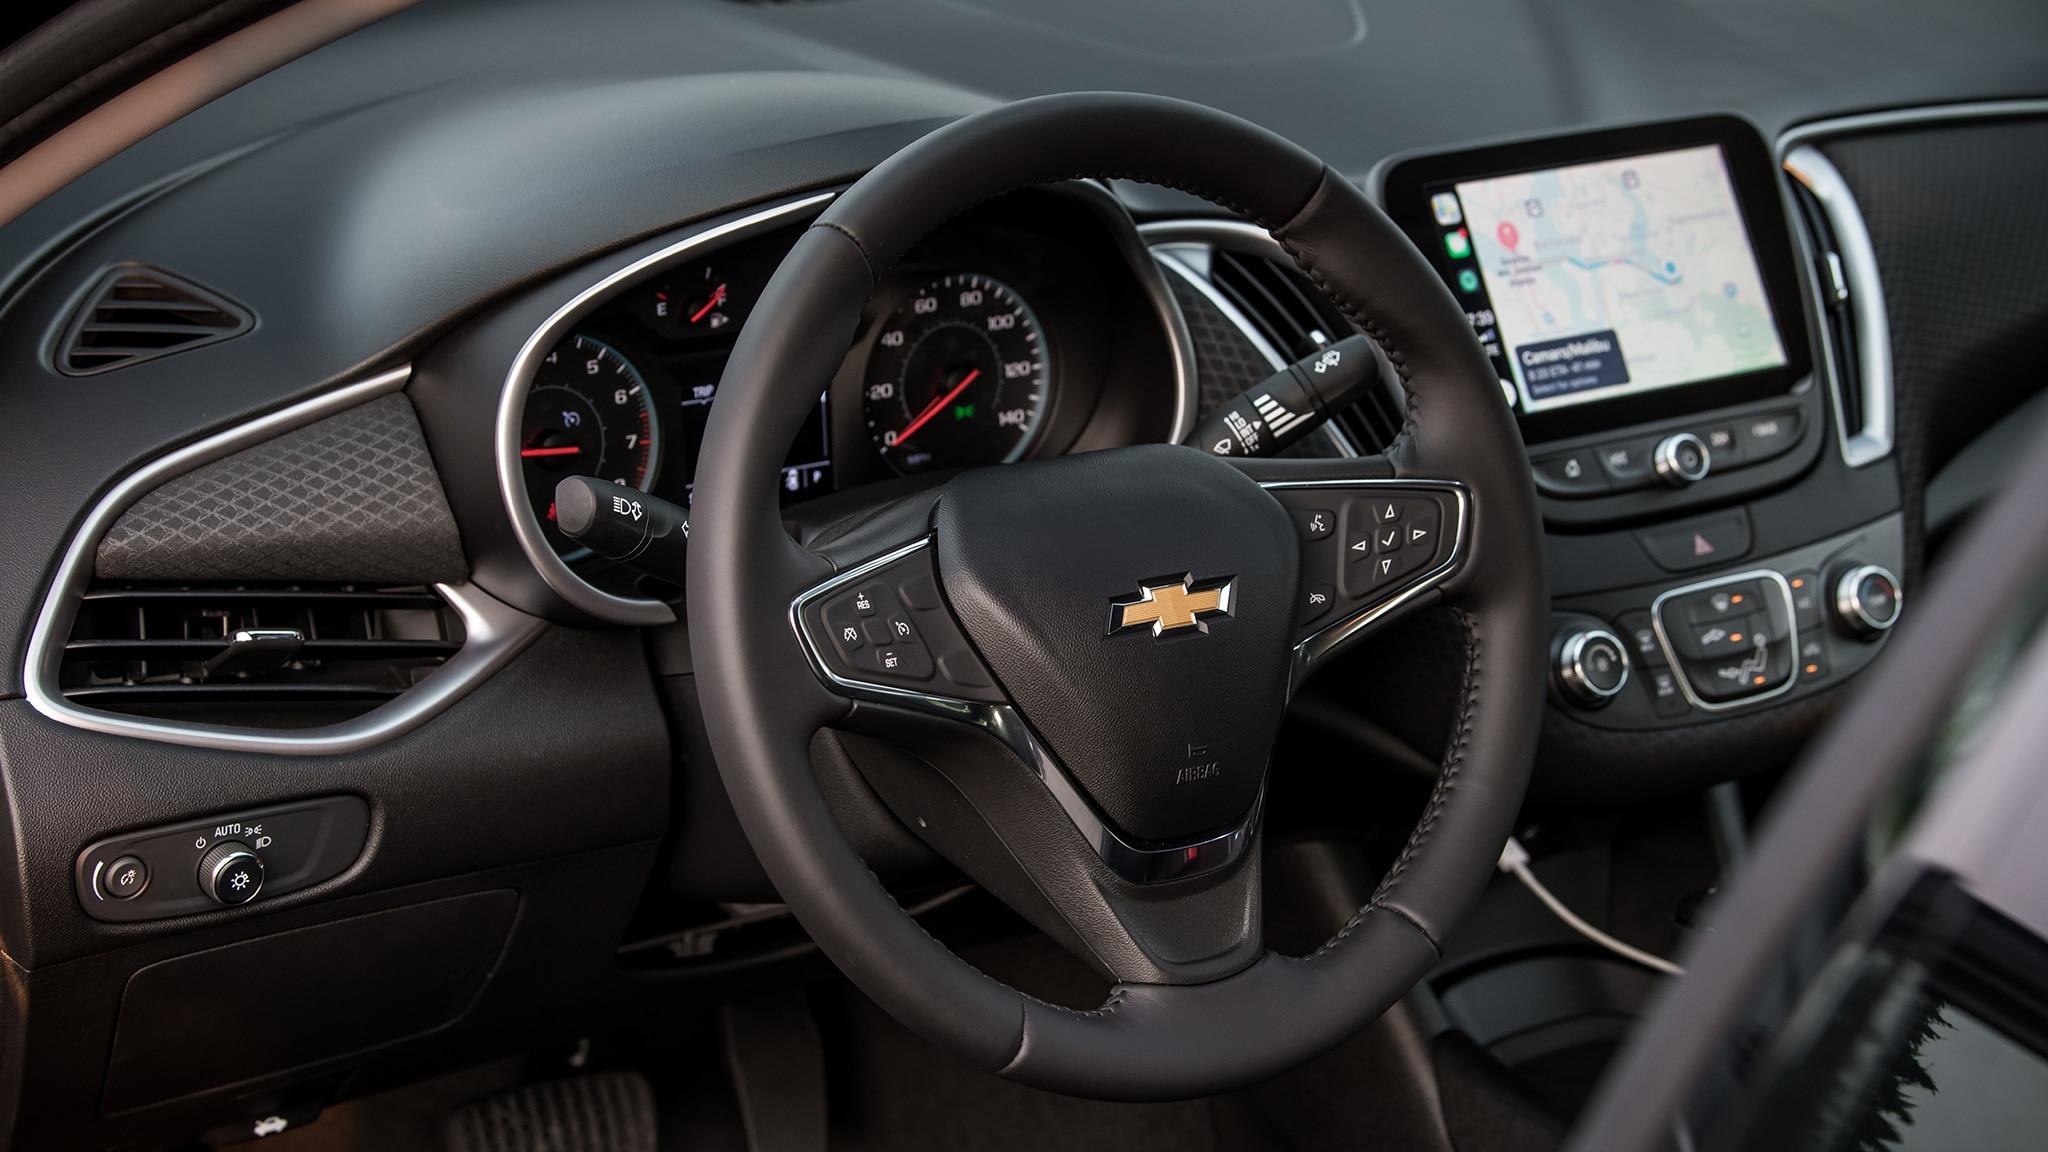 Primer manejo del Chevrolet Malibu RS 2019: expandiendo la ...